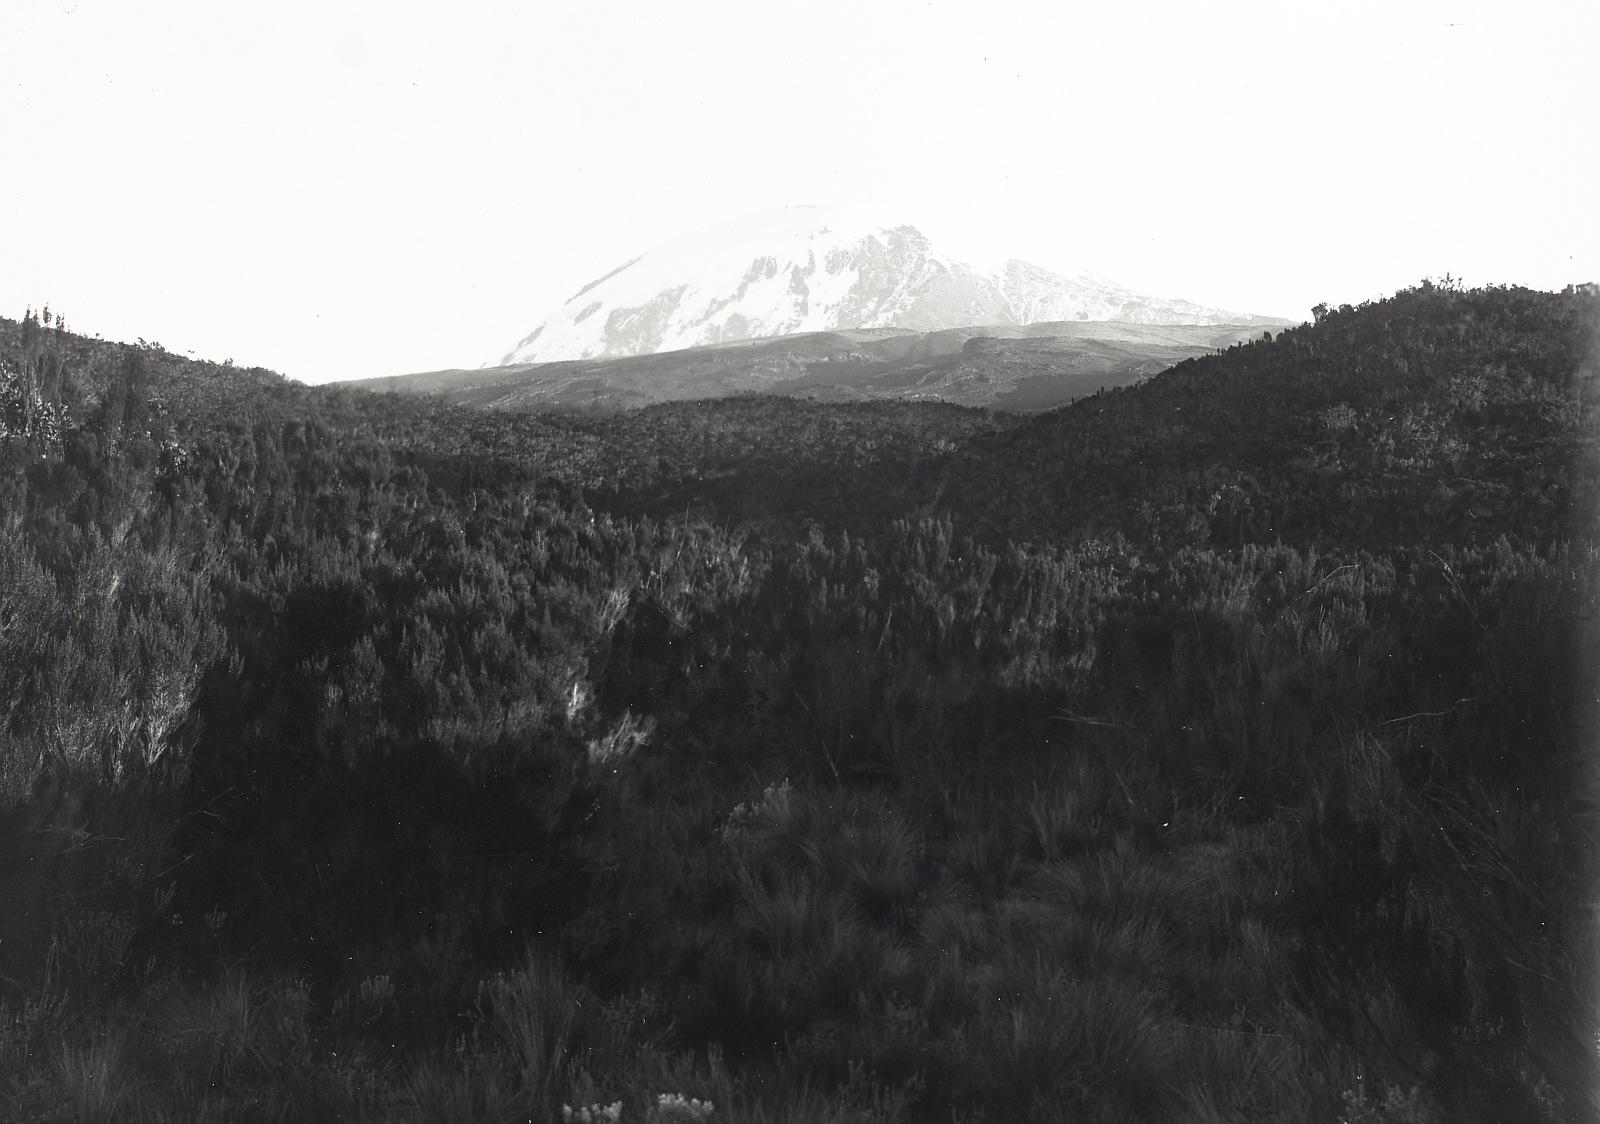 12. Килиманджаро. Кибо. Вид с юга на юго-запад